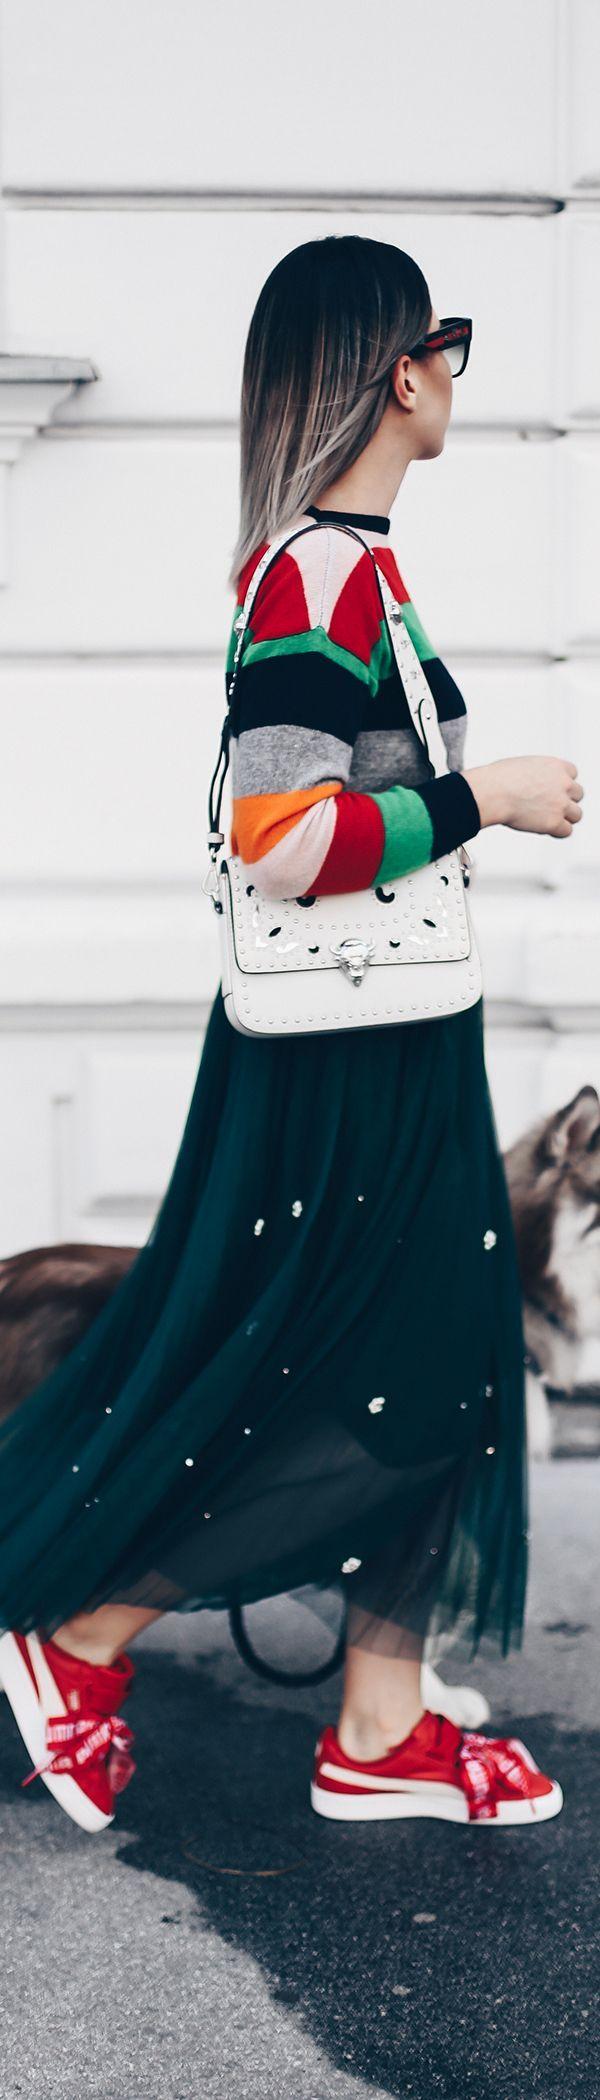 Tüllrock Outfit im Alltag kombinieren, Sneakers zum Rock, Styling Tipps, Outfit Ideen, Fashion Blog, Modeblog, Puma Basket Heart Sneakers, Bold Strip…